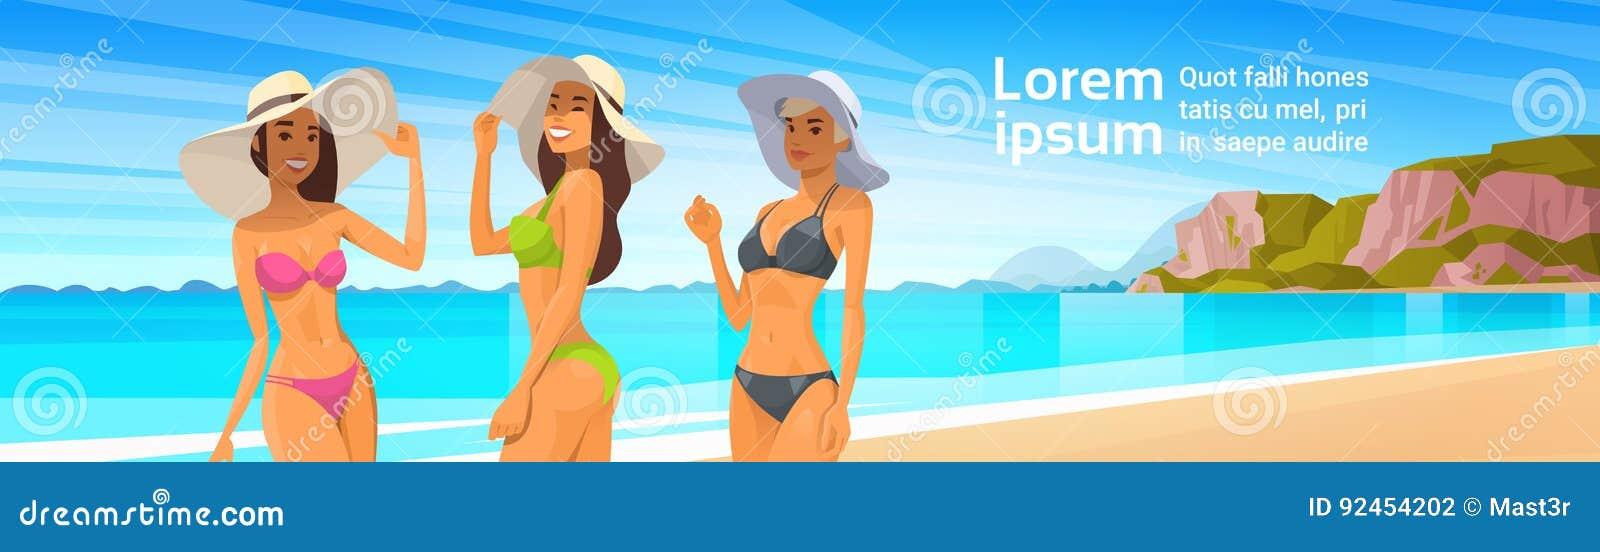 bb21d7db2212f Royalty-Free Vector. Three Woman In Bikini On Beach, Girls Wear Hat On  Summer Sea Vacation